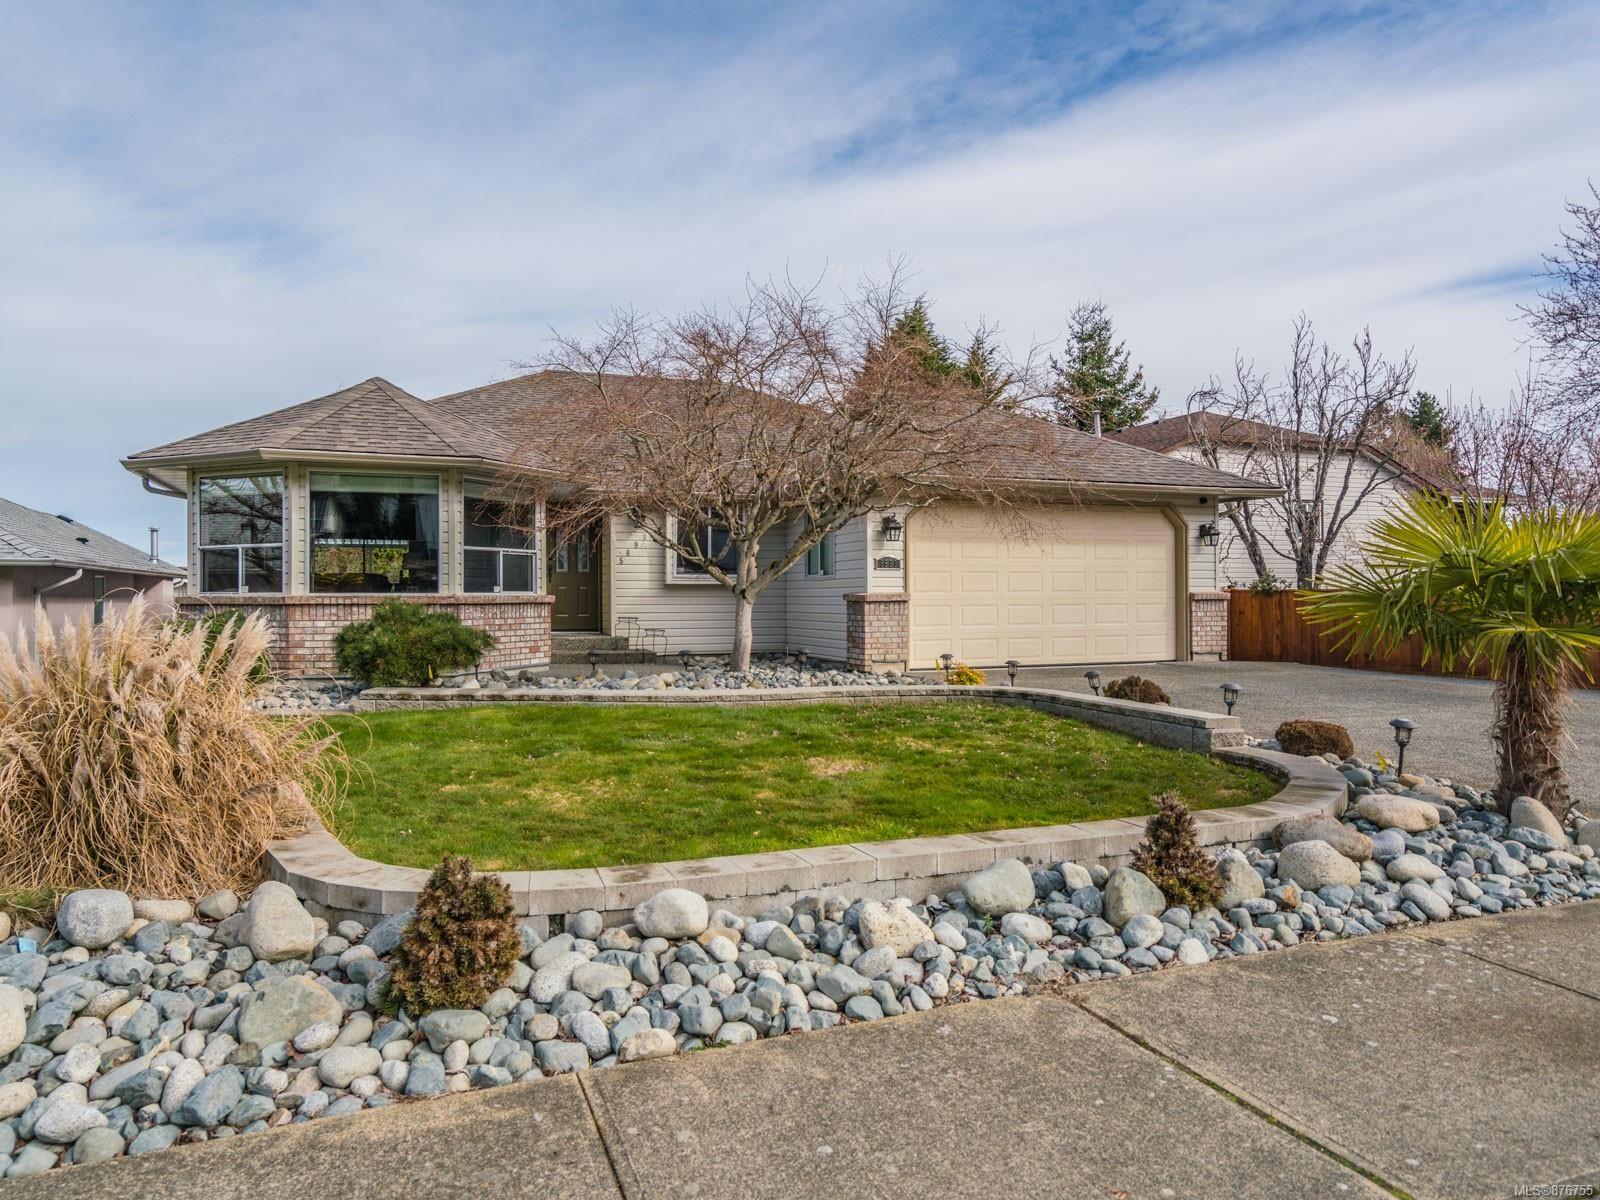 Main Photo: 5691 Carrington Rd in : Na North Nanaimo House for sale (Nanaimo)  : MLS®# 876755